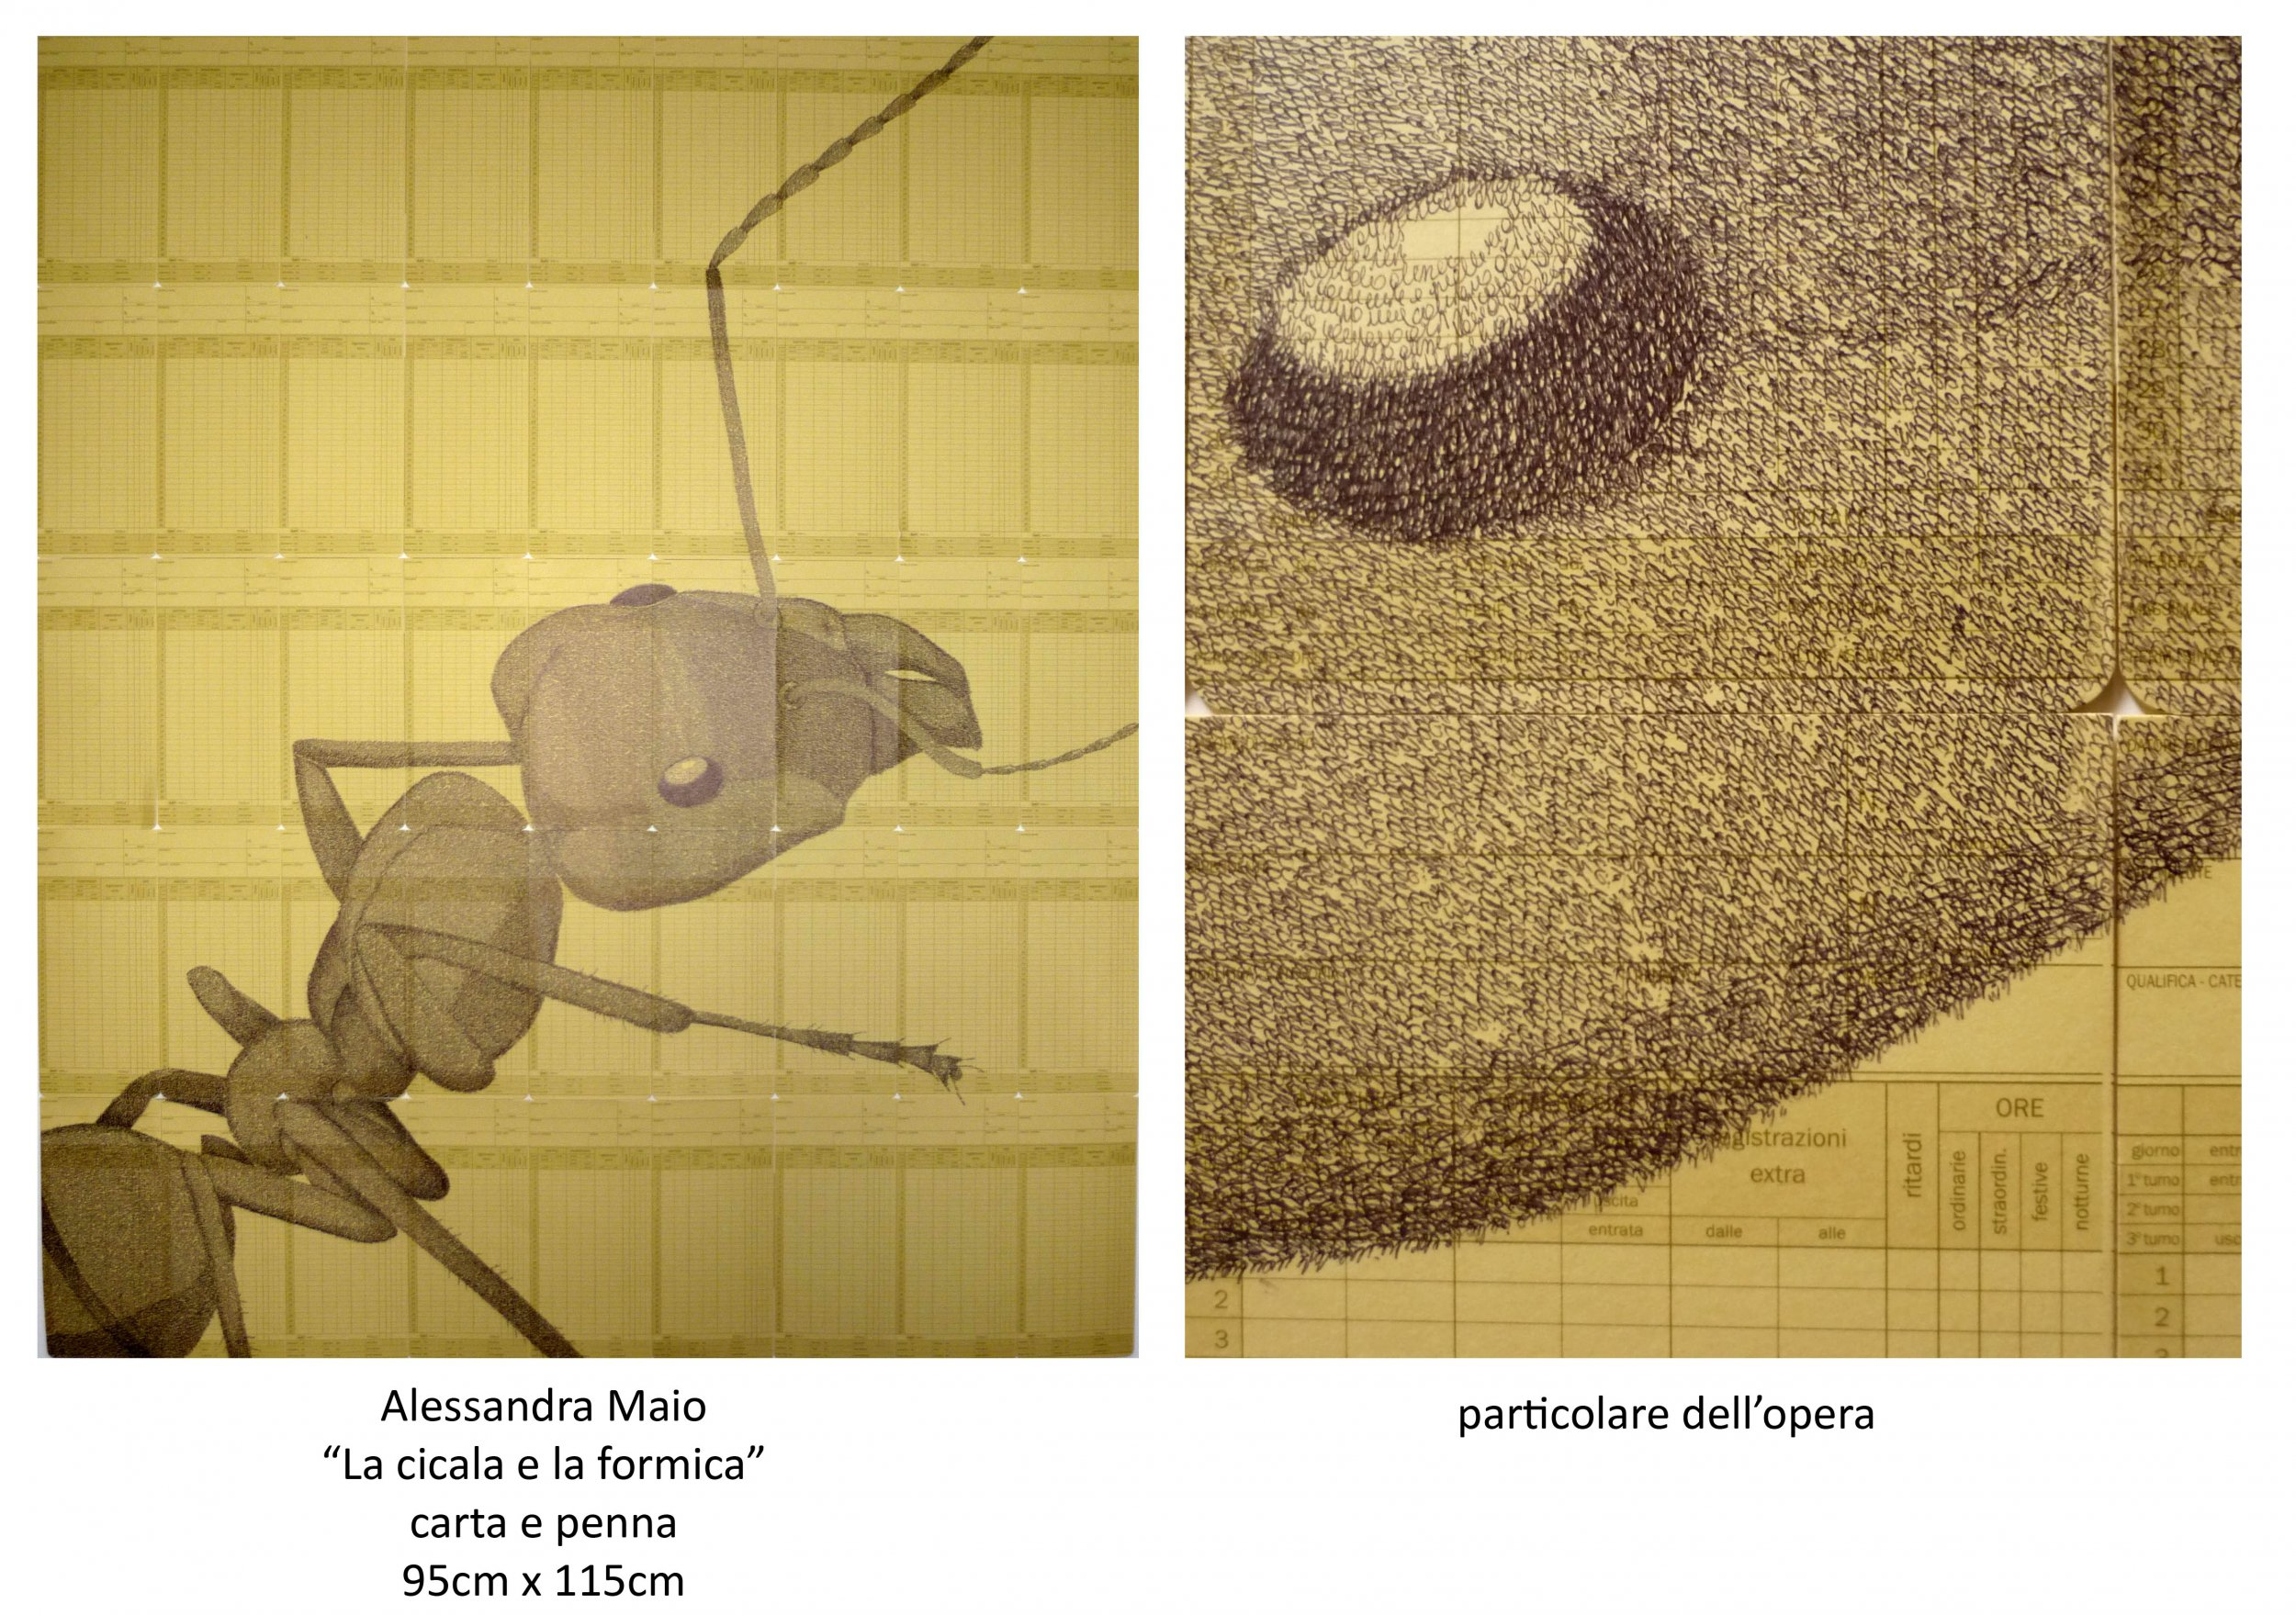 La cicala e formica alessandra maio opera celeste